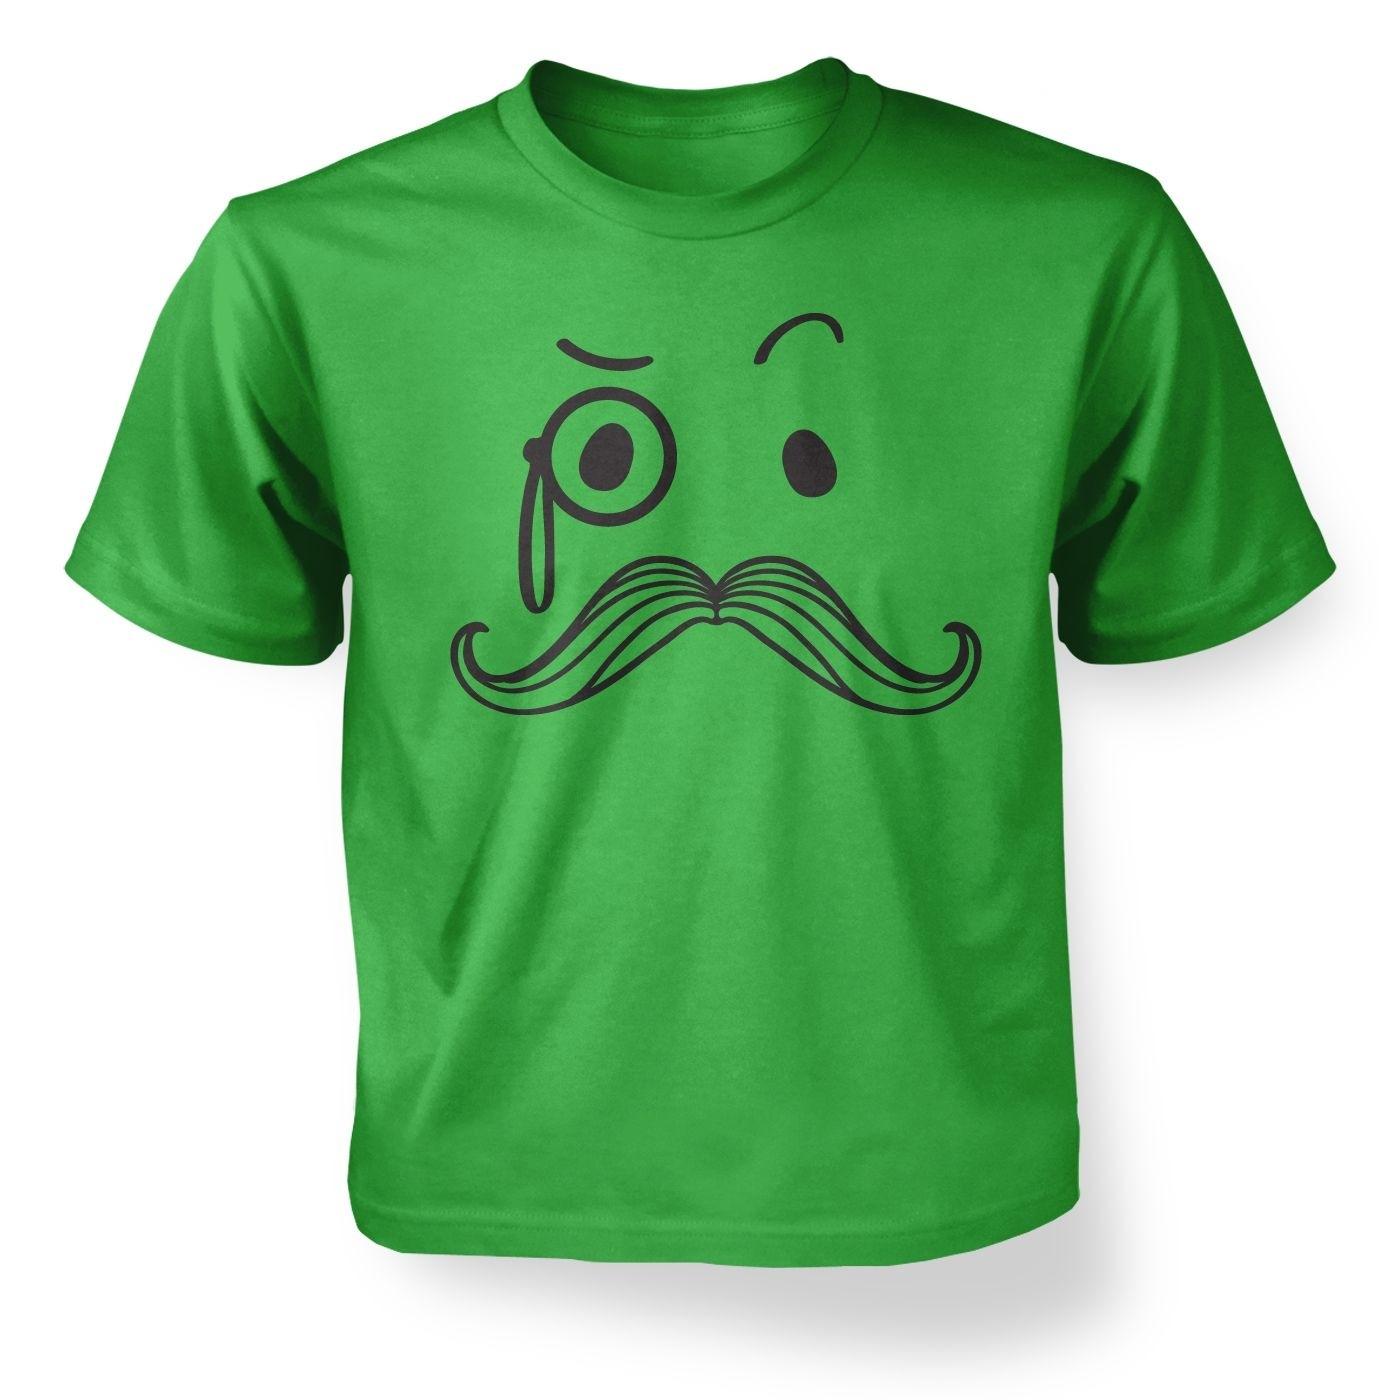 Kid's Monocle and Moustache t-shirt